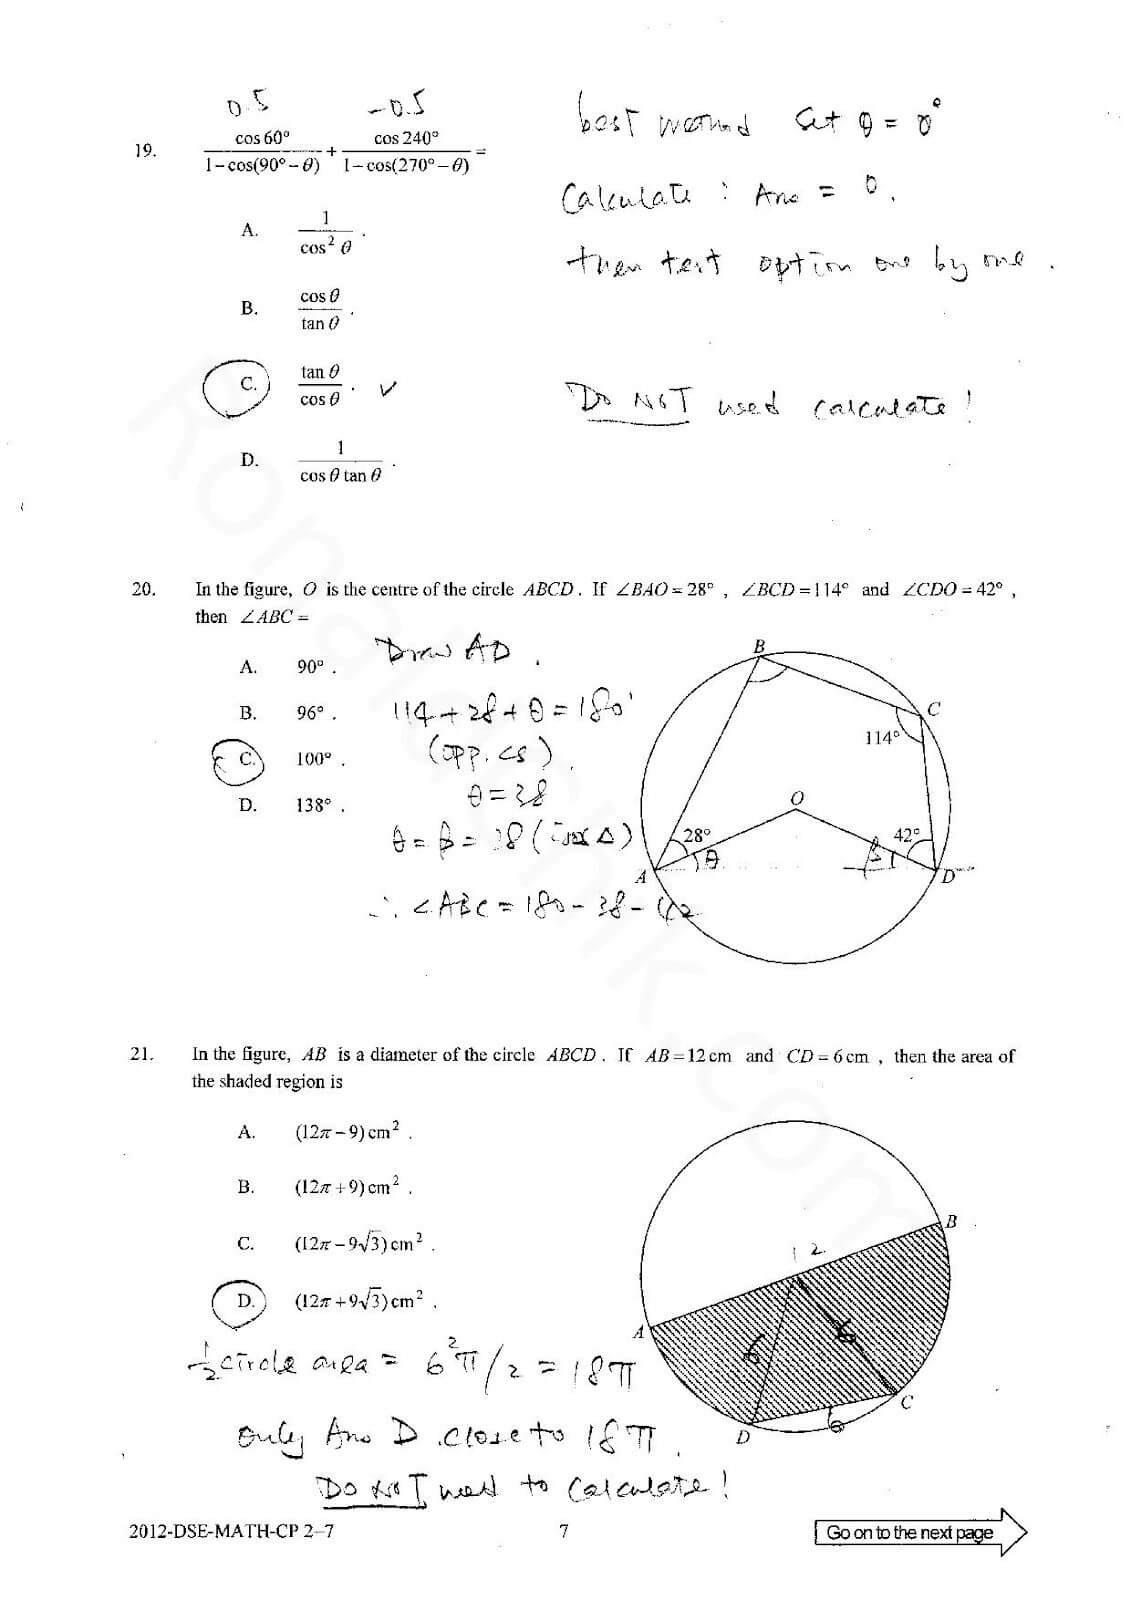 2012 DSE Math P2 卷二 Q19,20,21